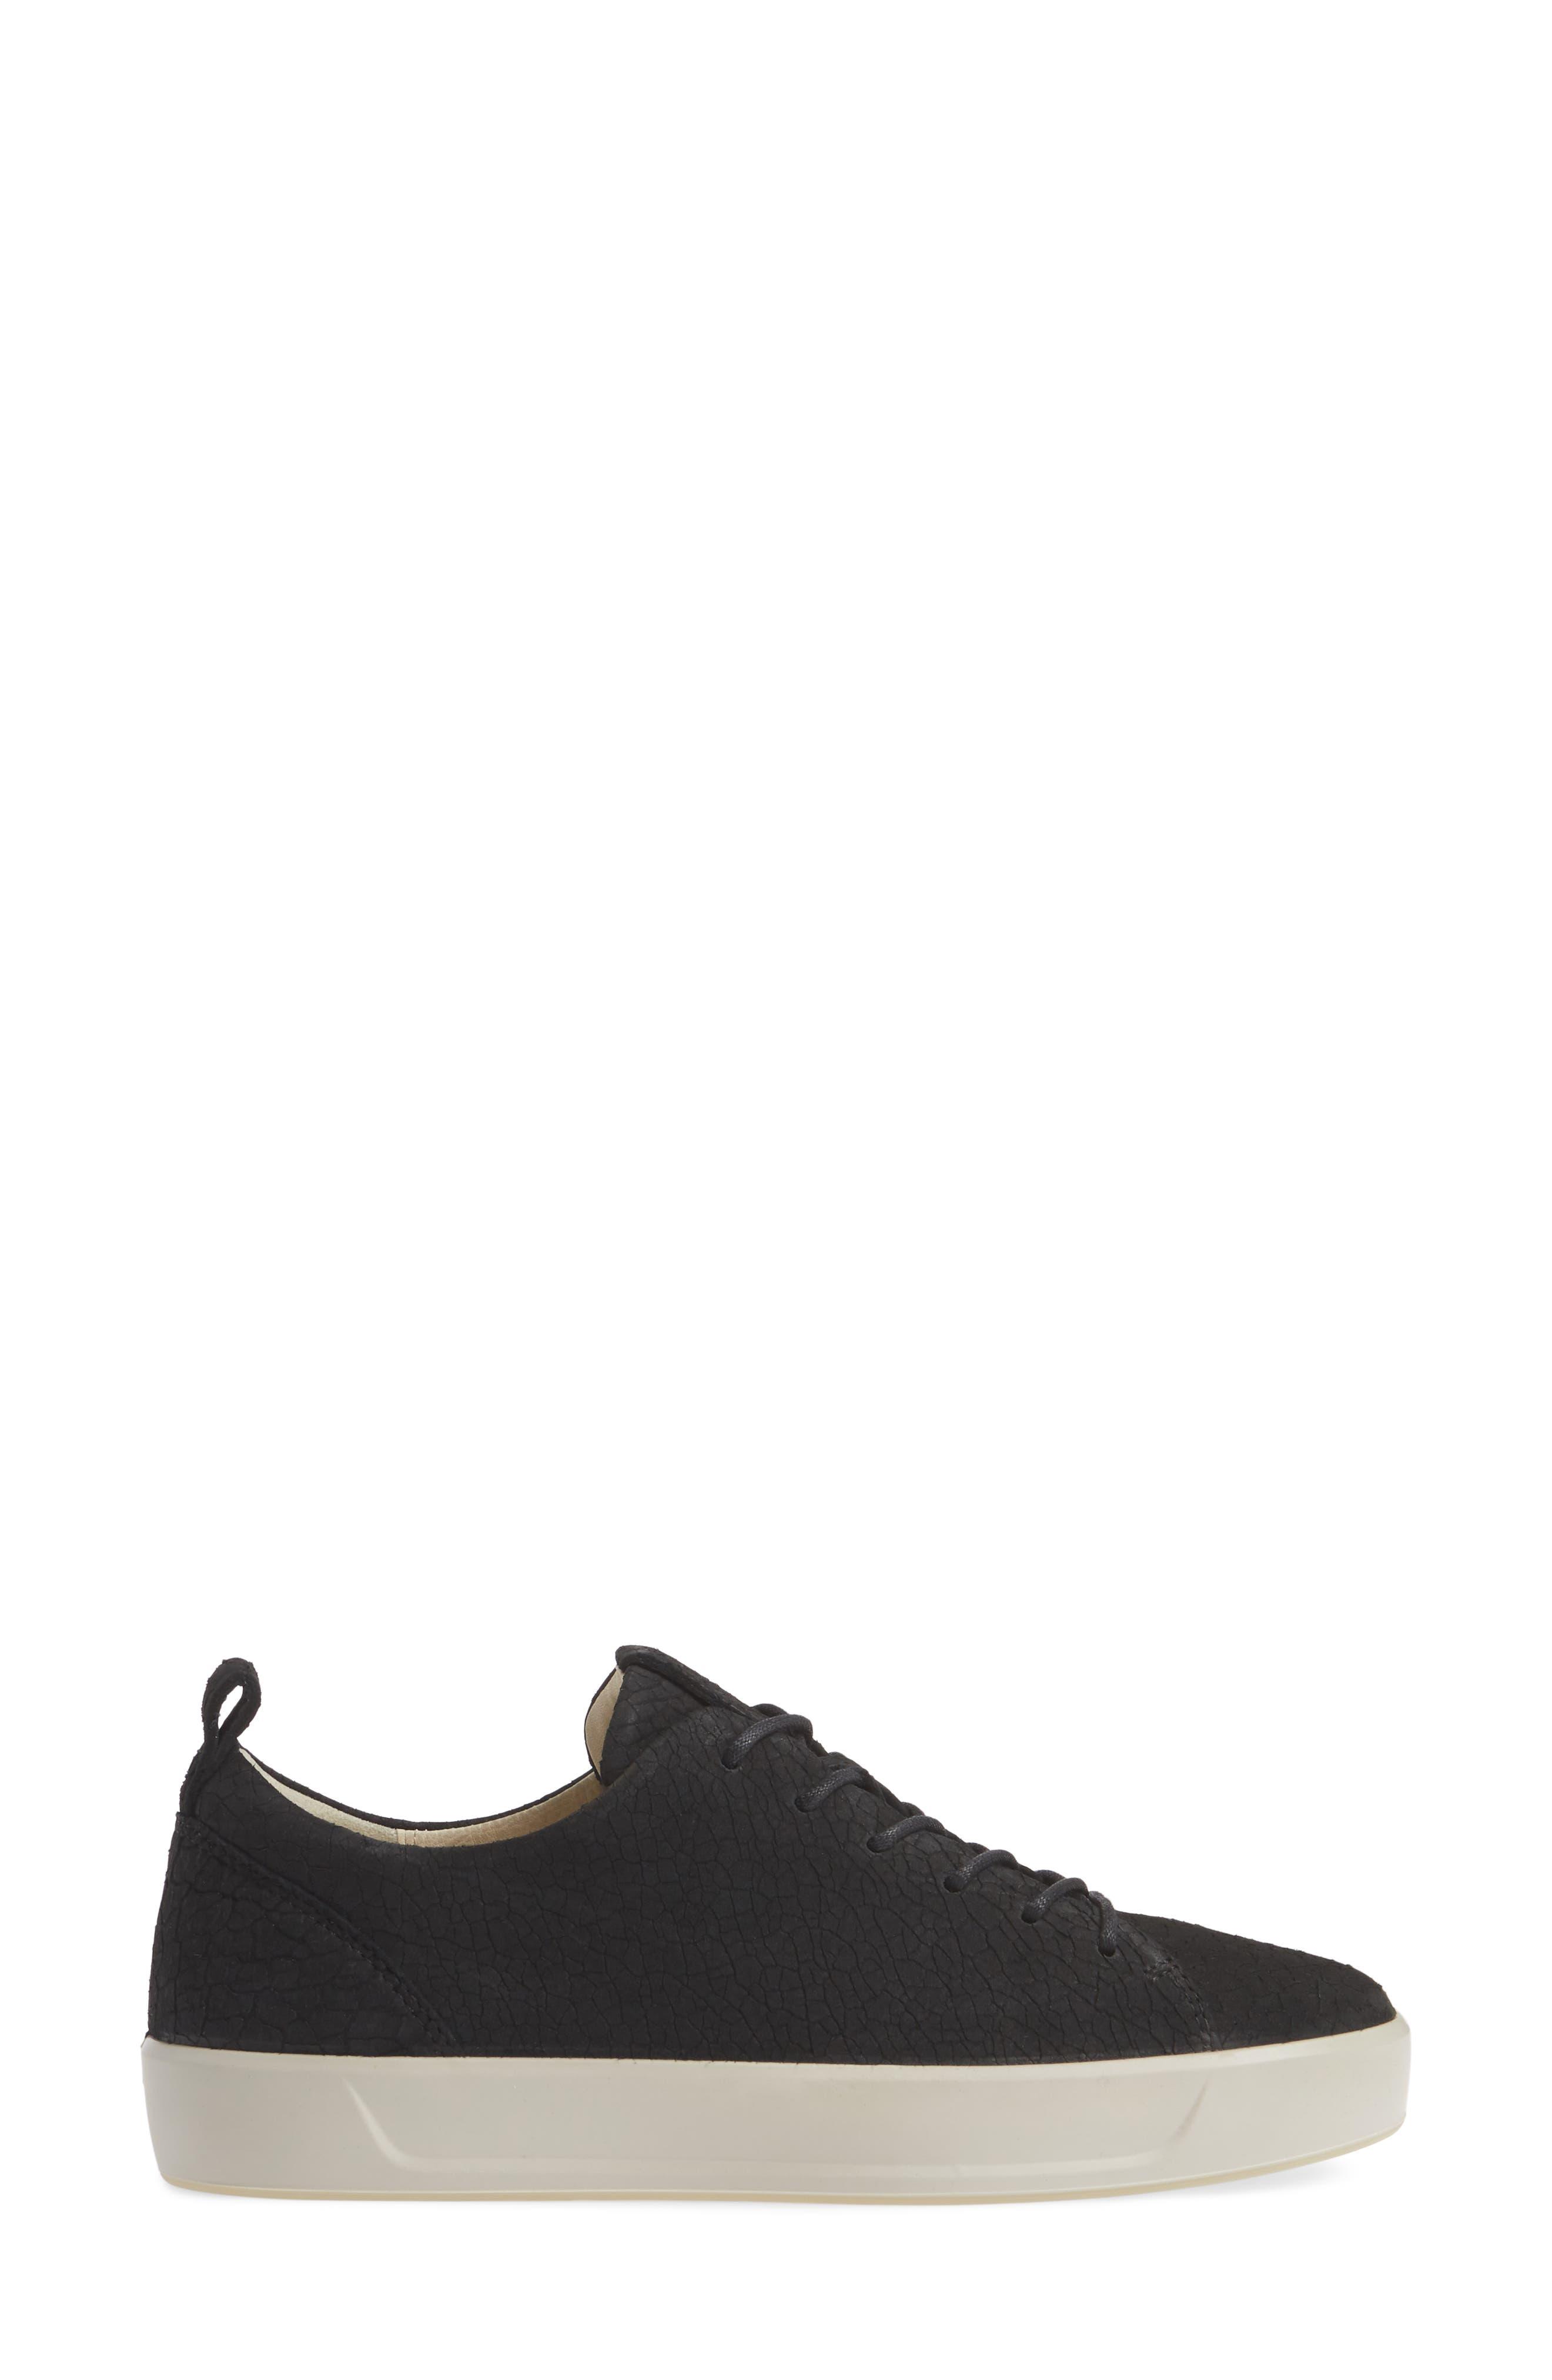 Soft 8 Sneaker,                             Alternate thumbnail 3, color,                             BLACK CRACKLED LEATHER